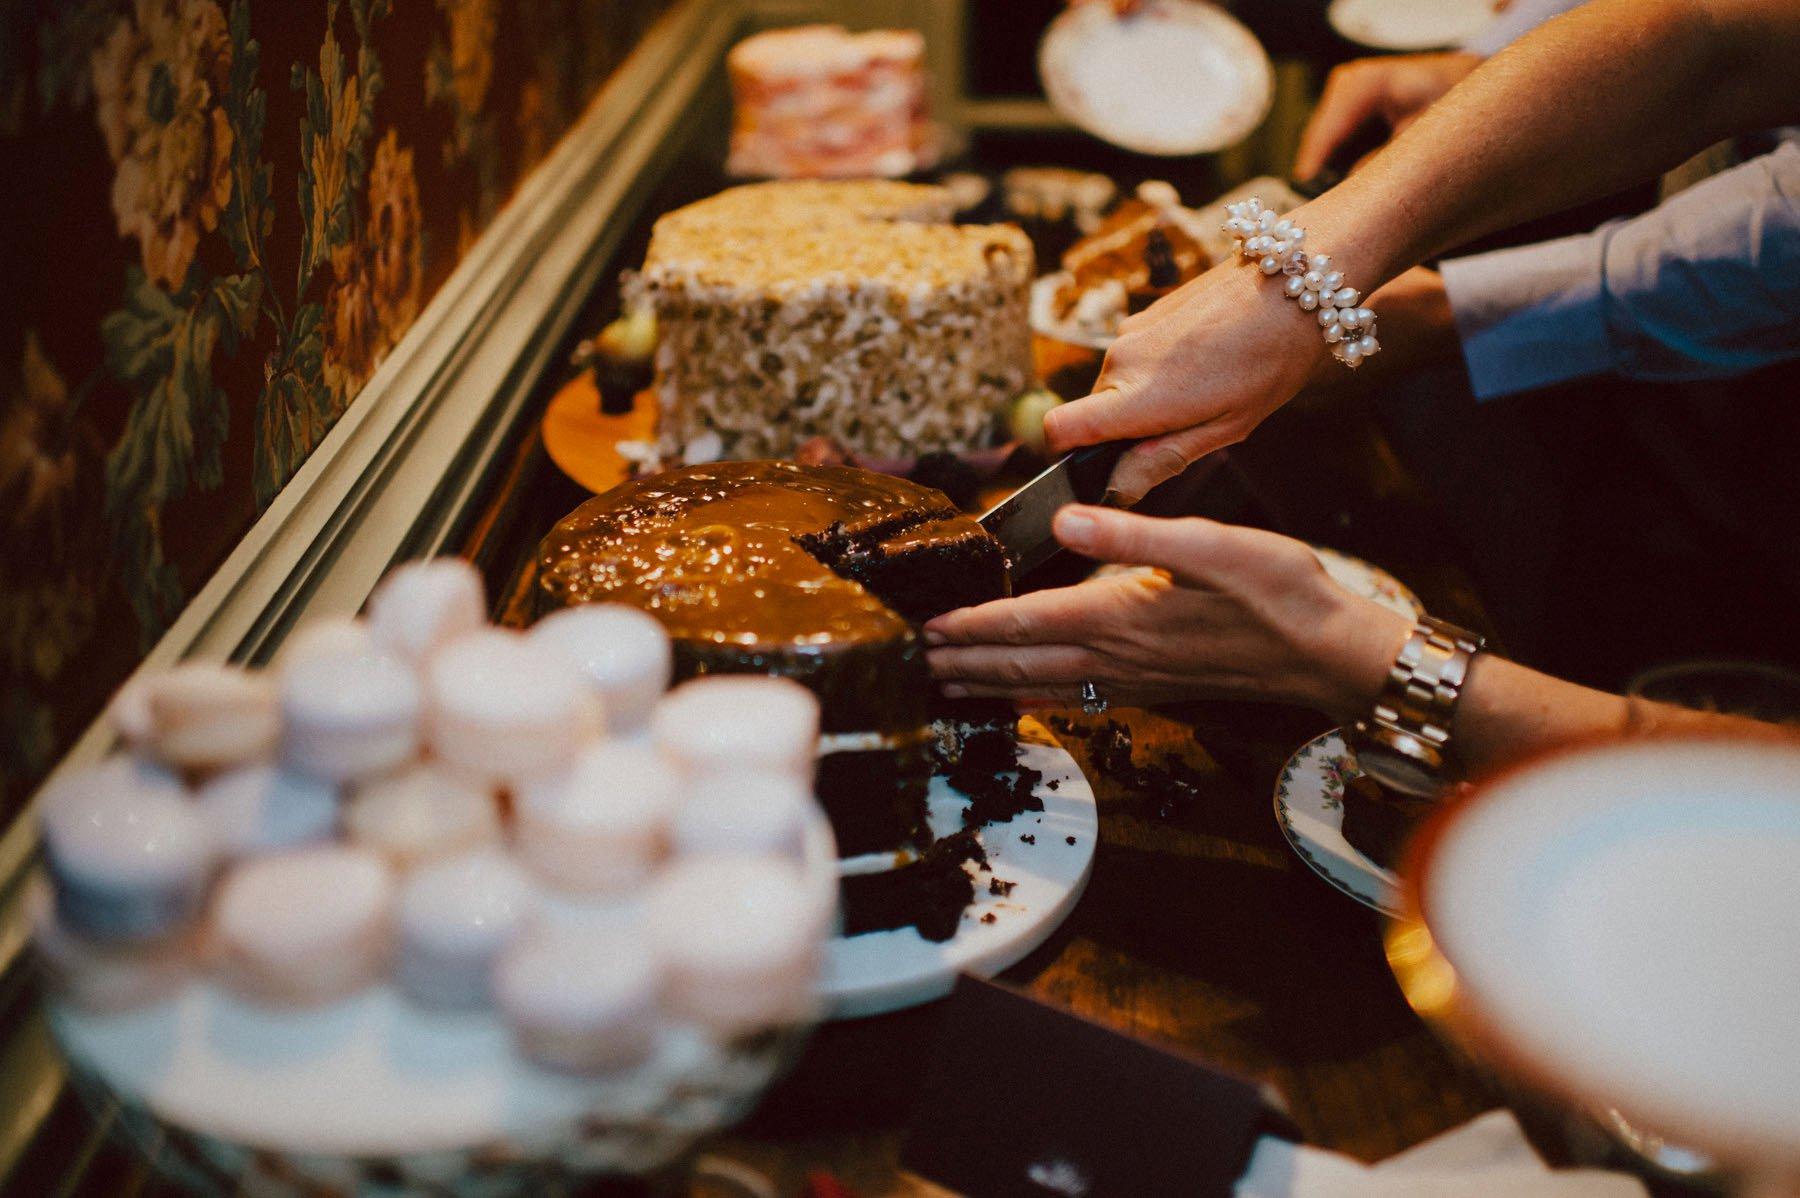 faunbrook-bed-and-breakfast-wedding-186.jpg